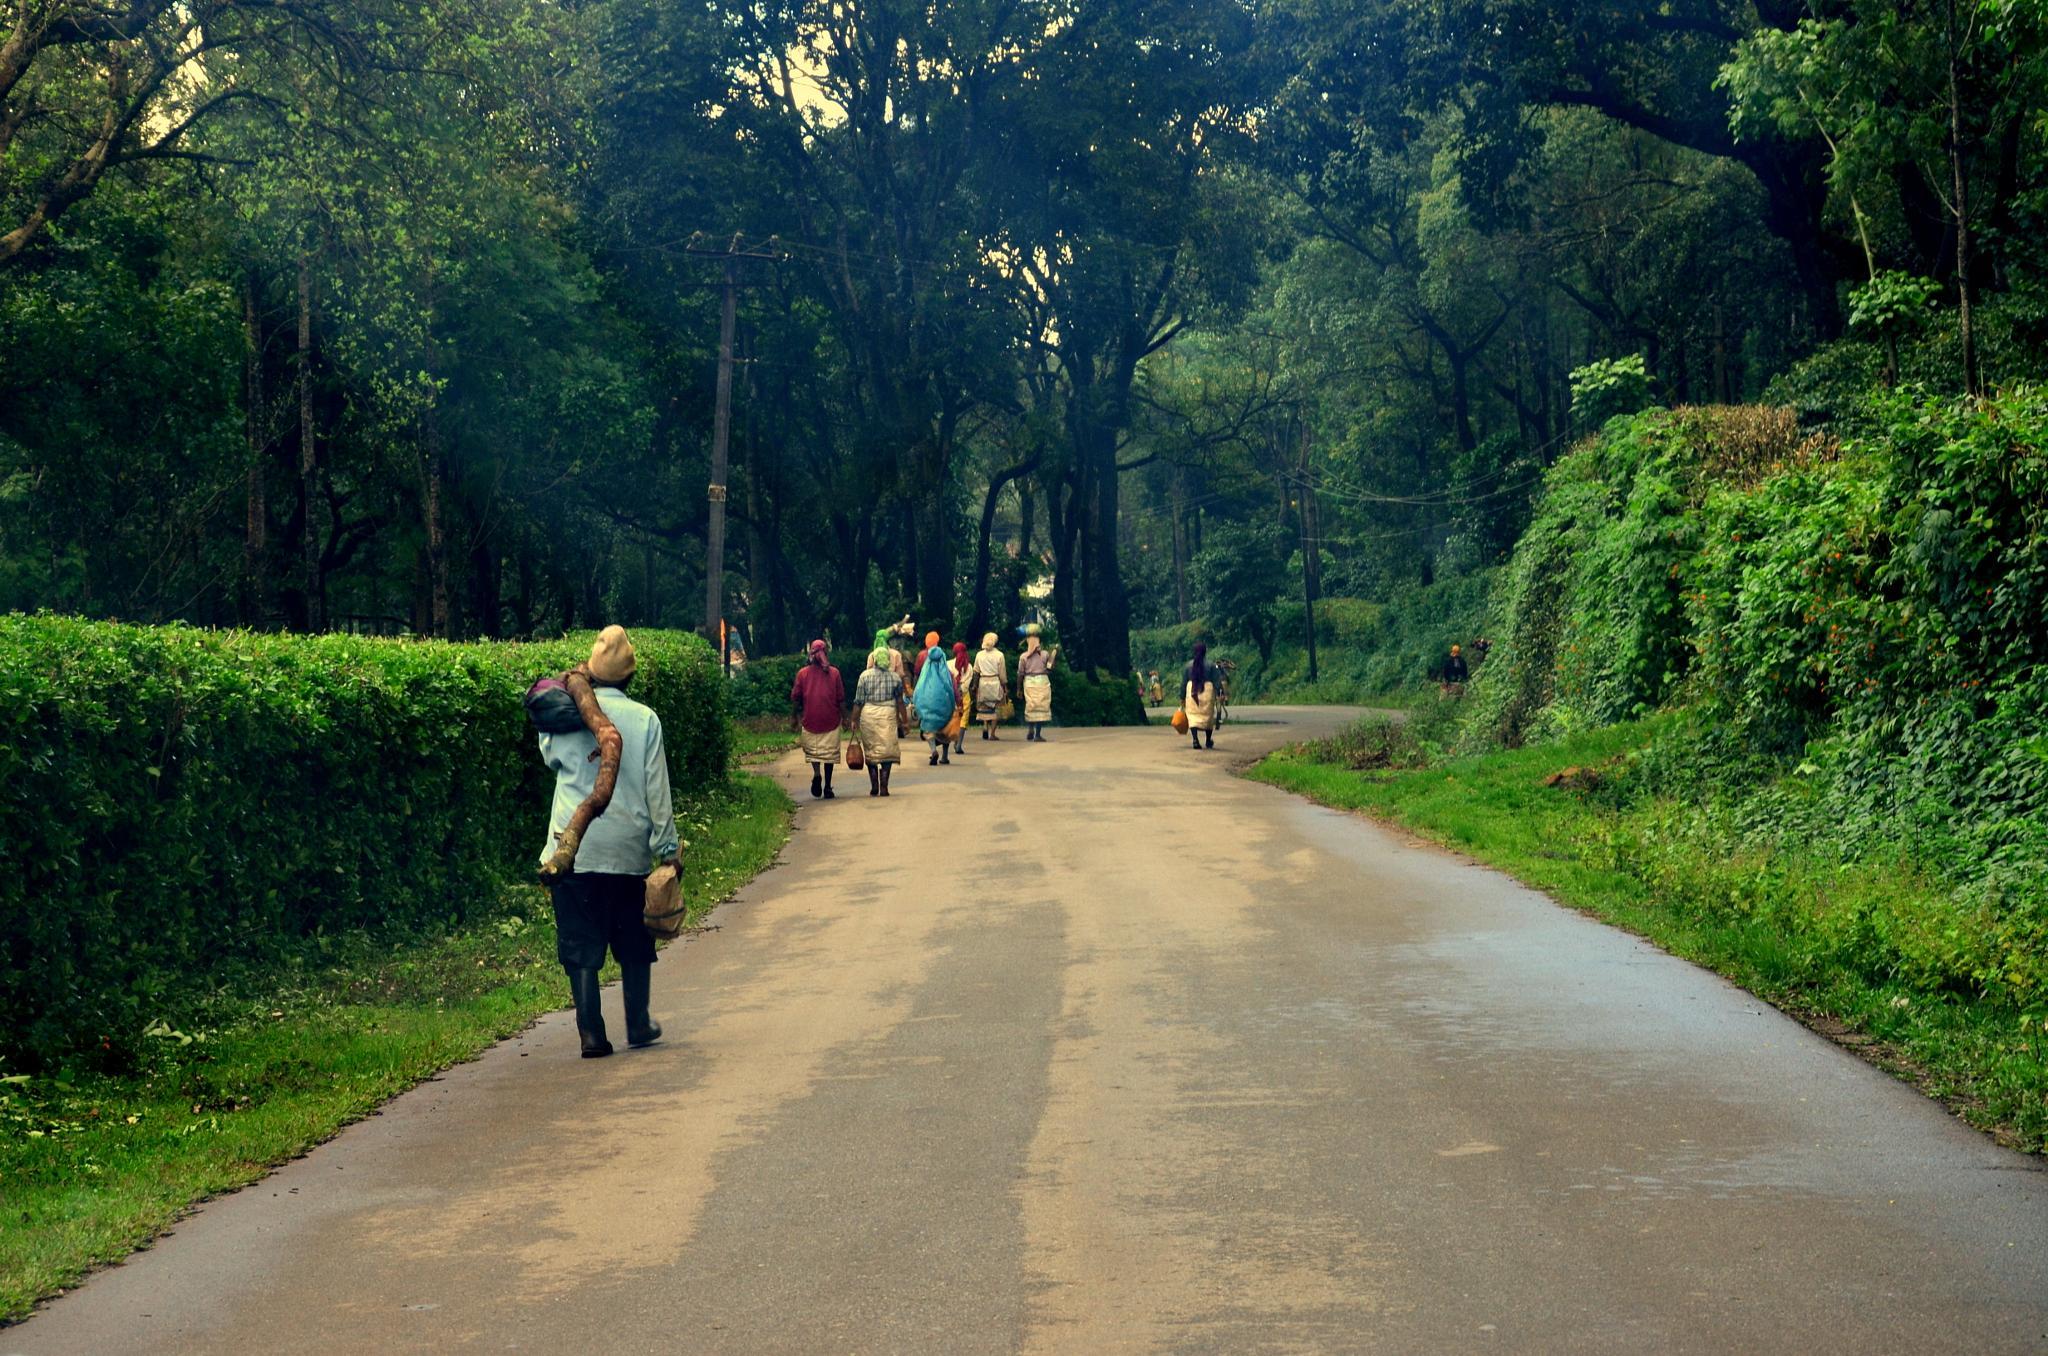 Returning Home After A Hard Day's Work... by sriramshankars